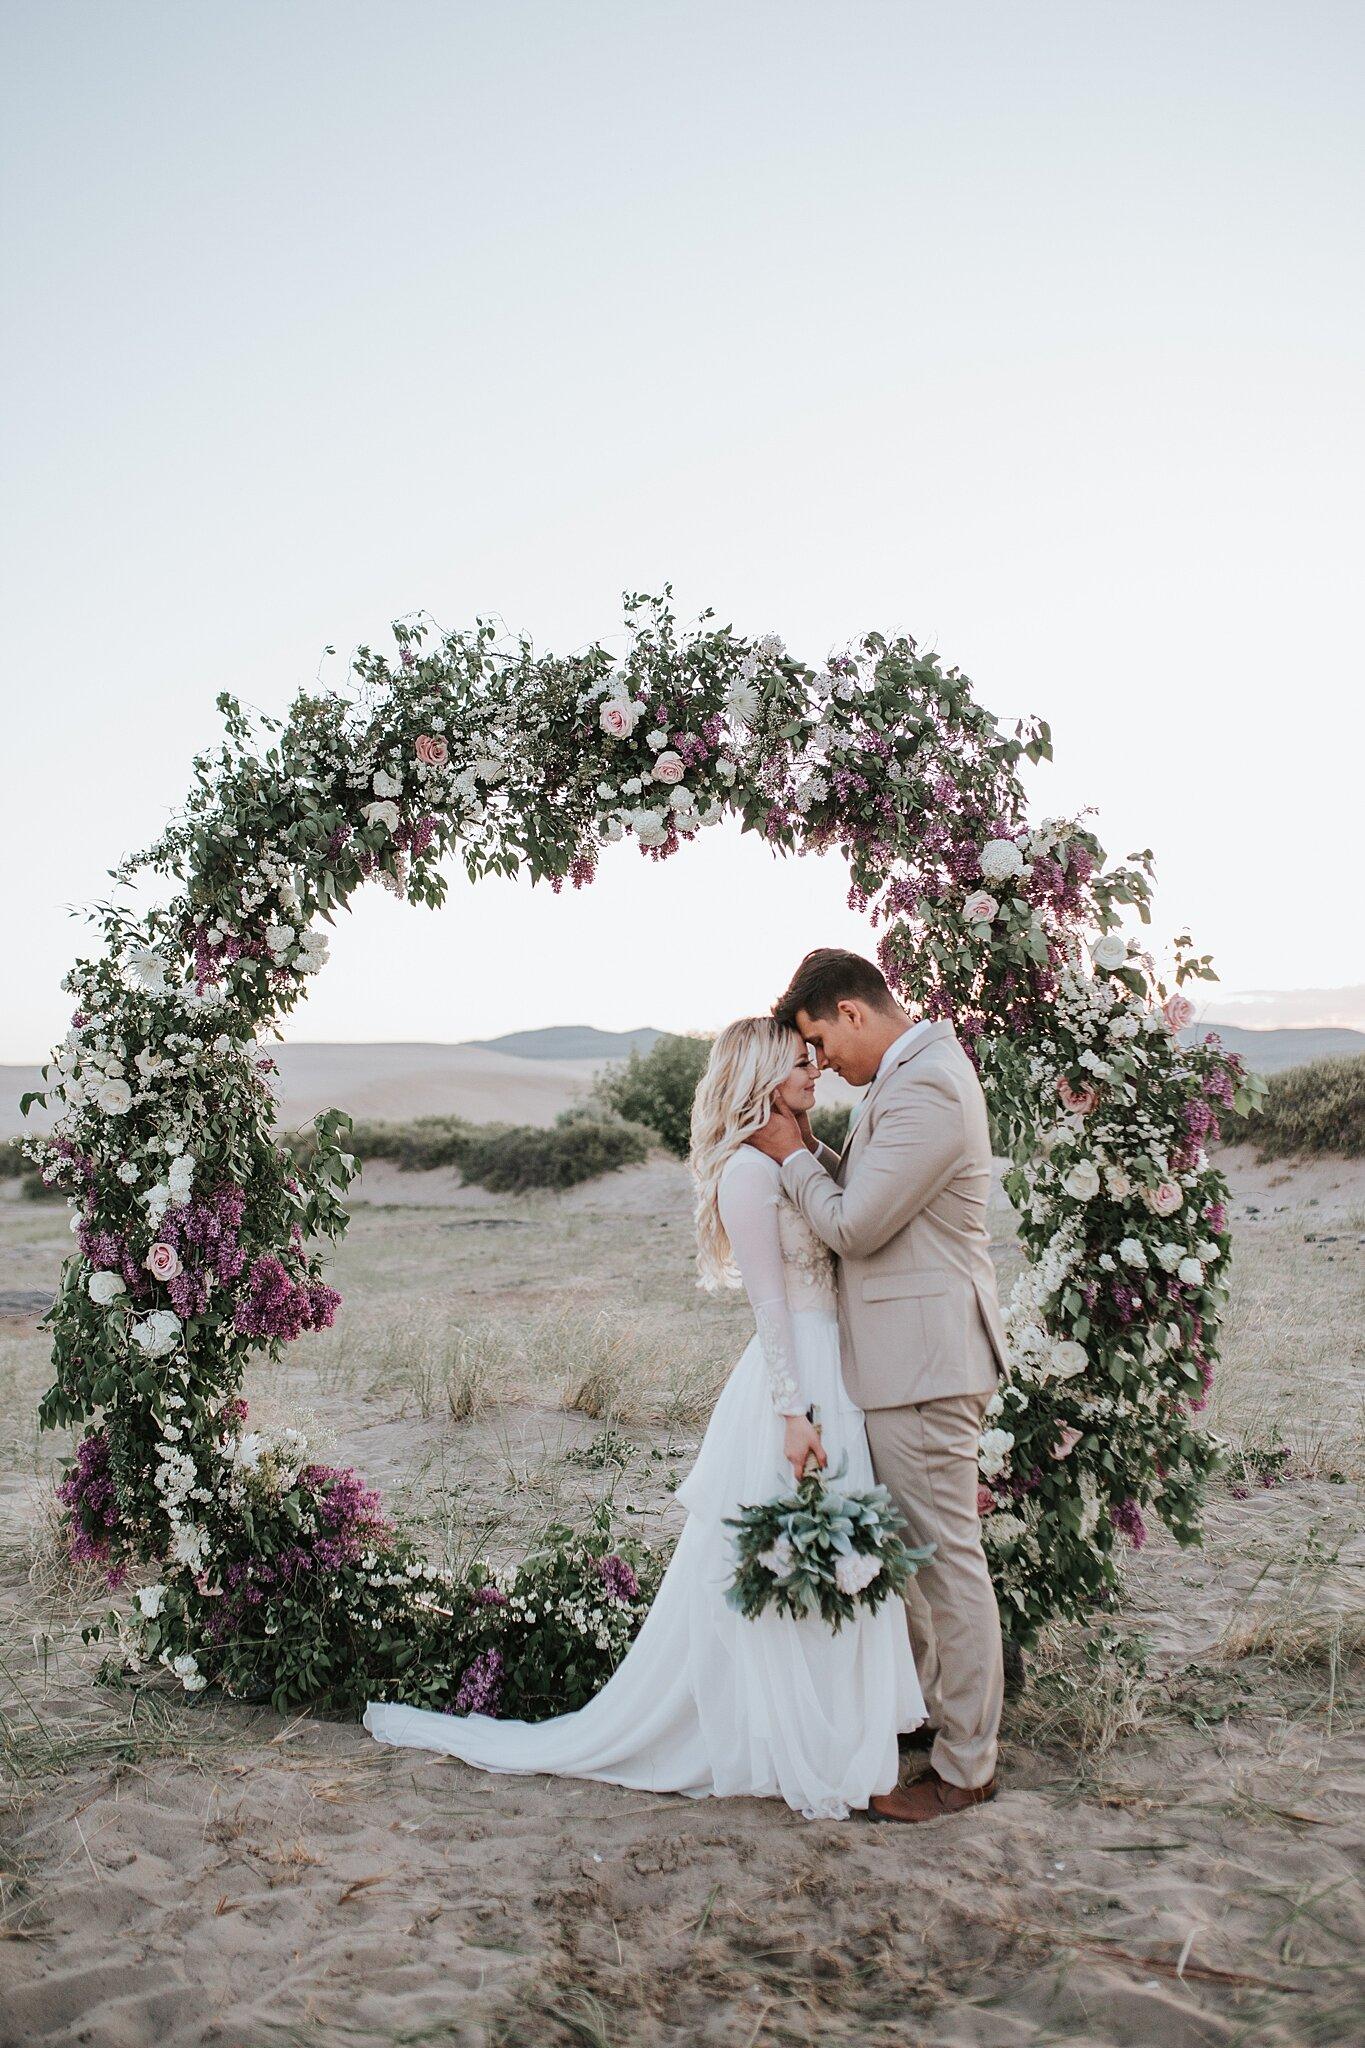 floral-arch-beach-adventure-wedding-california-bride-summer-wedding-look-for-the-light-photo-video